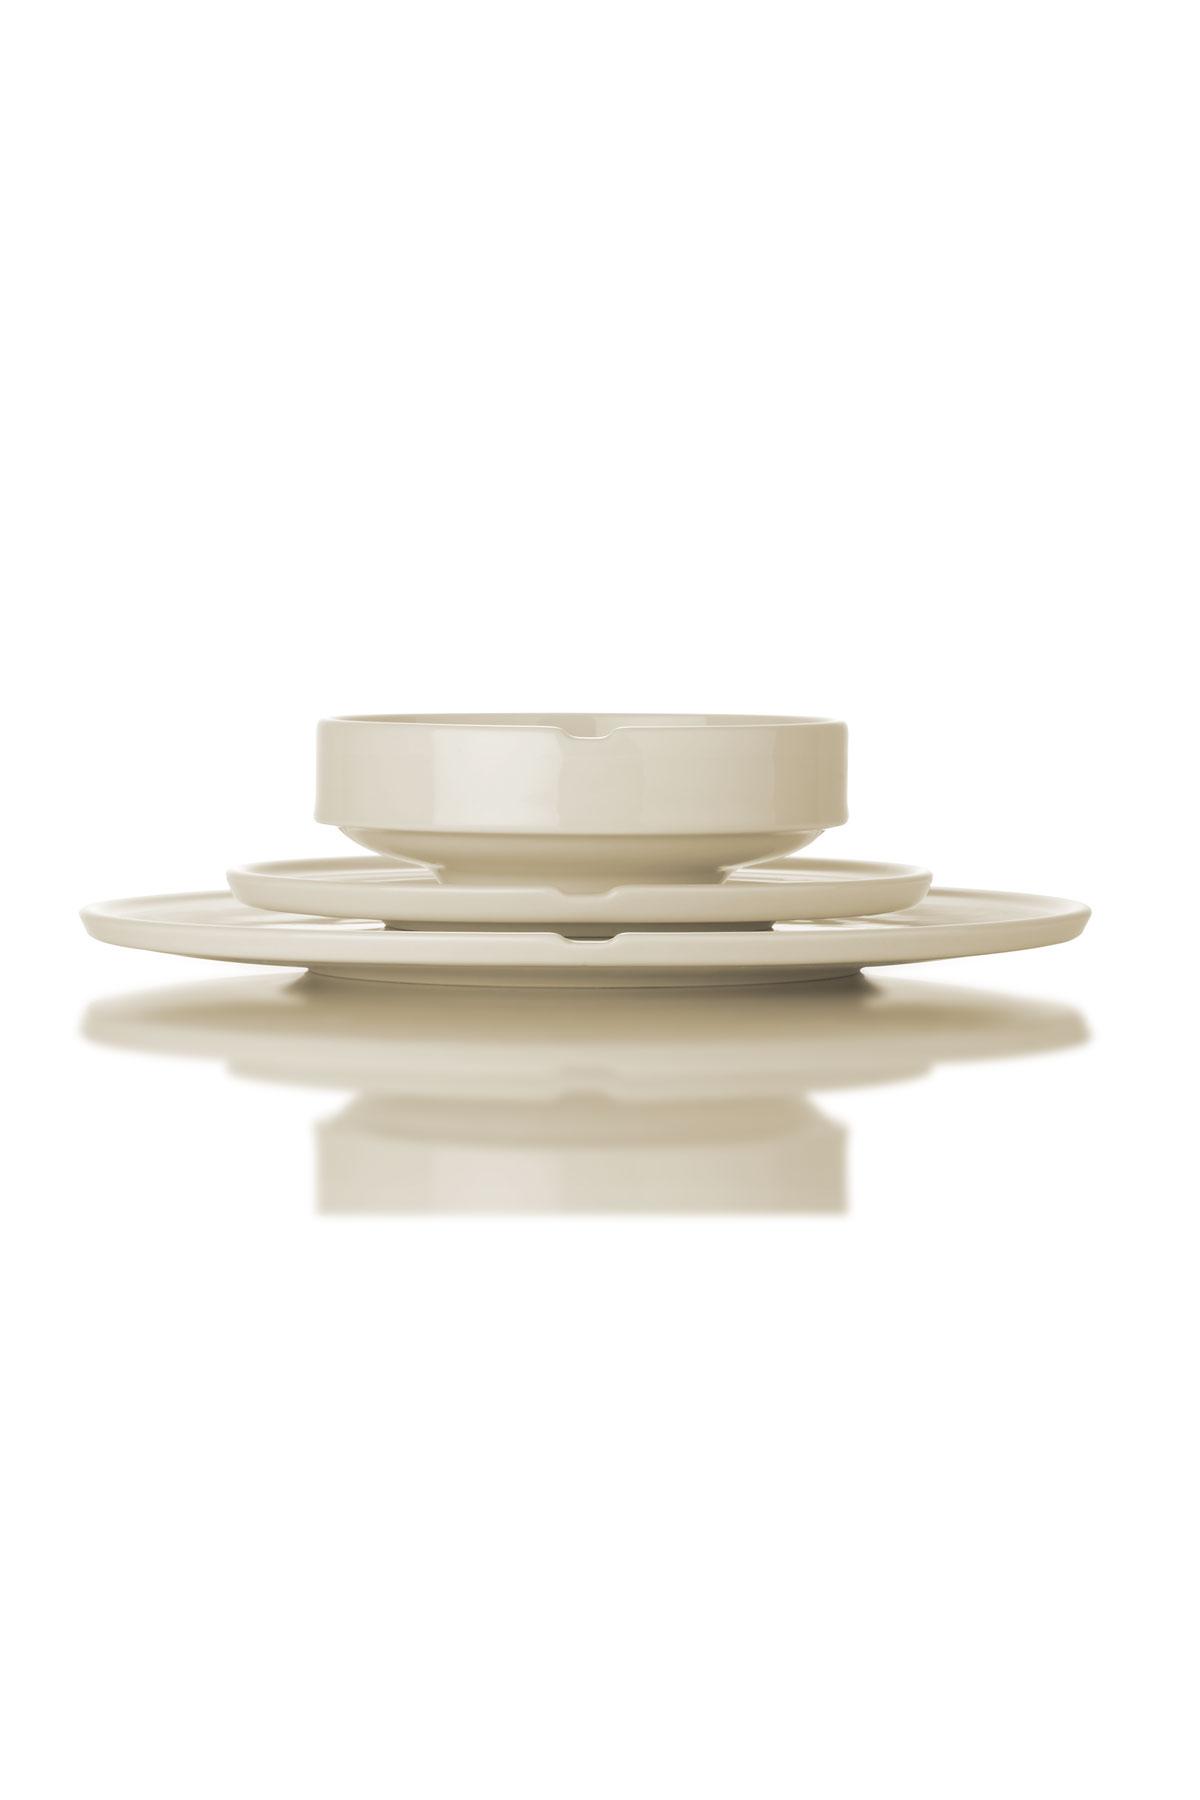 Kütahya Porselen Chef Taste Of 10 cm Joker Kase Krem